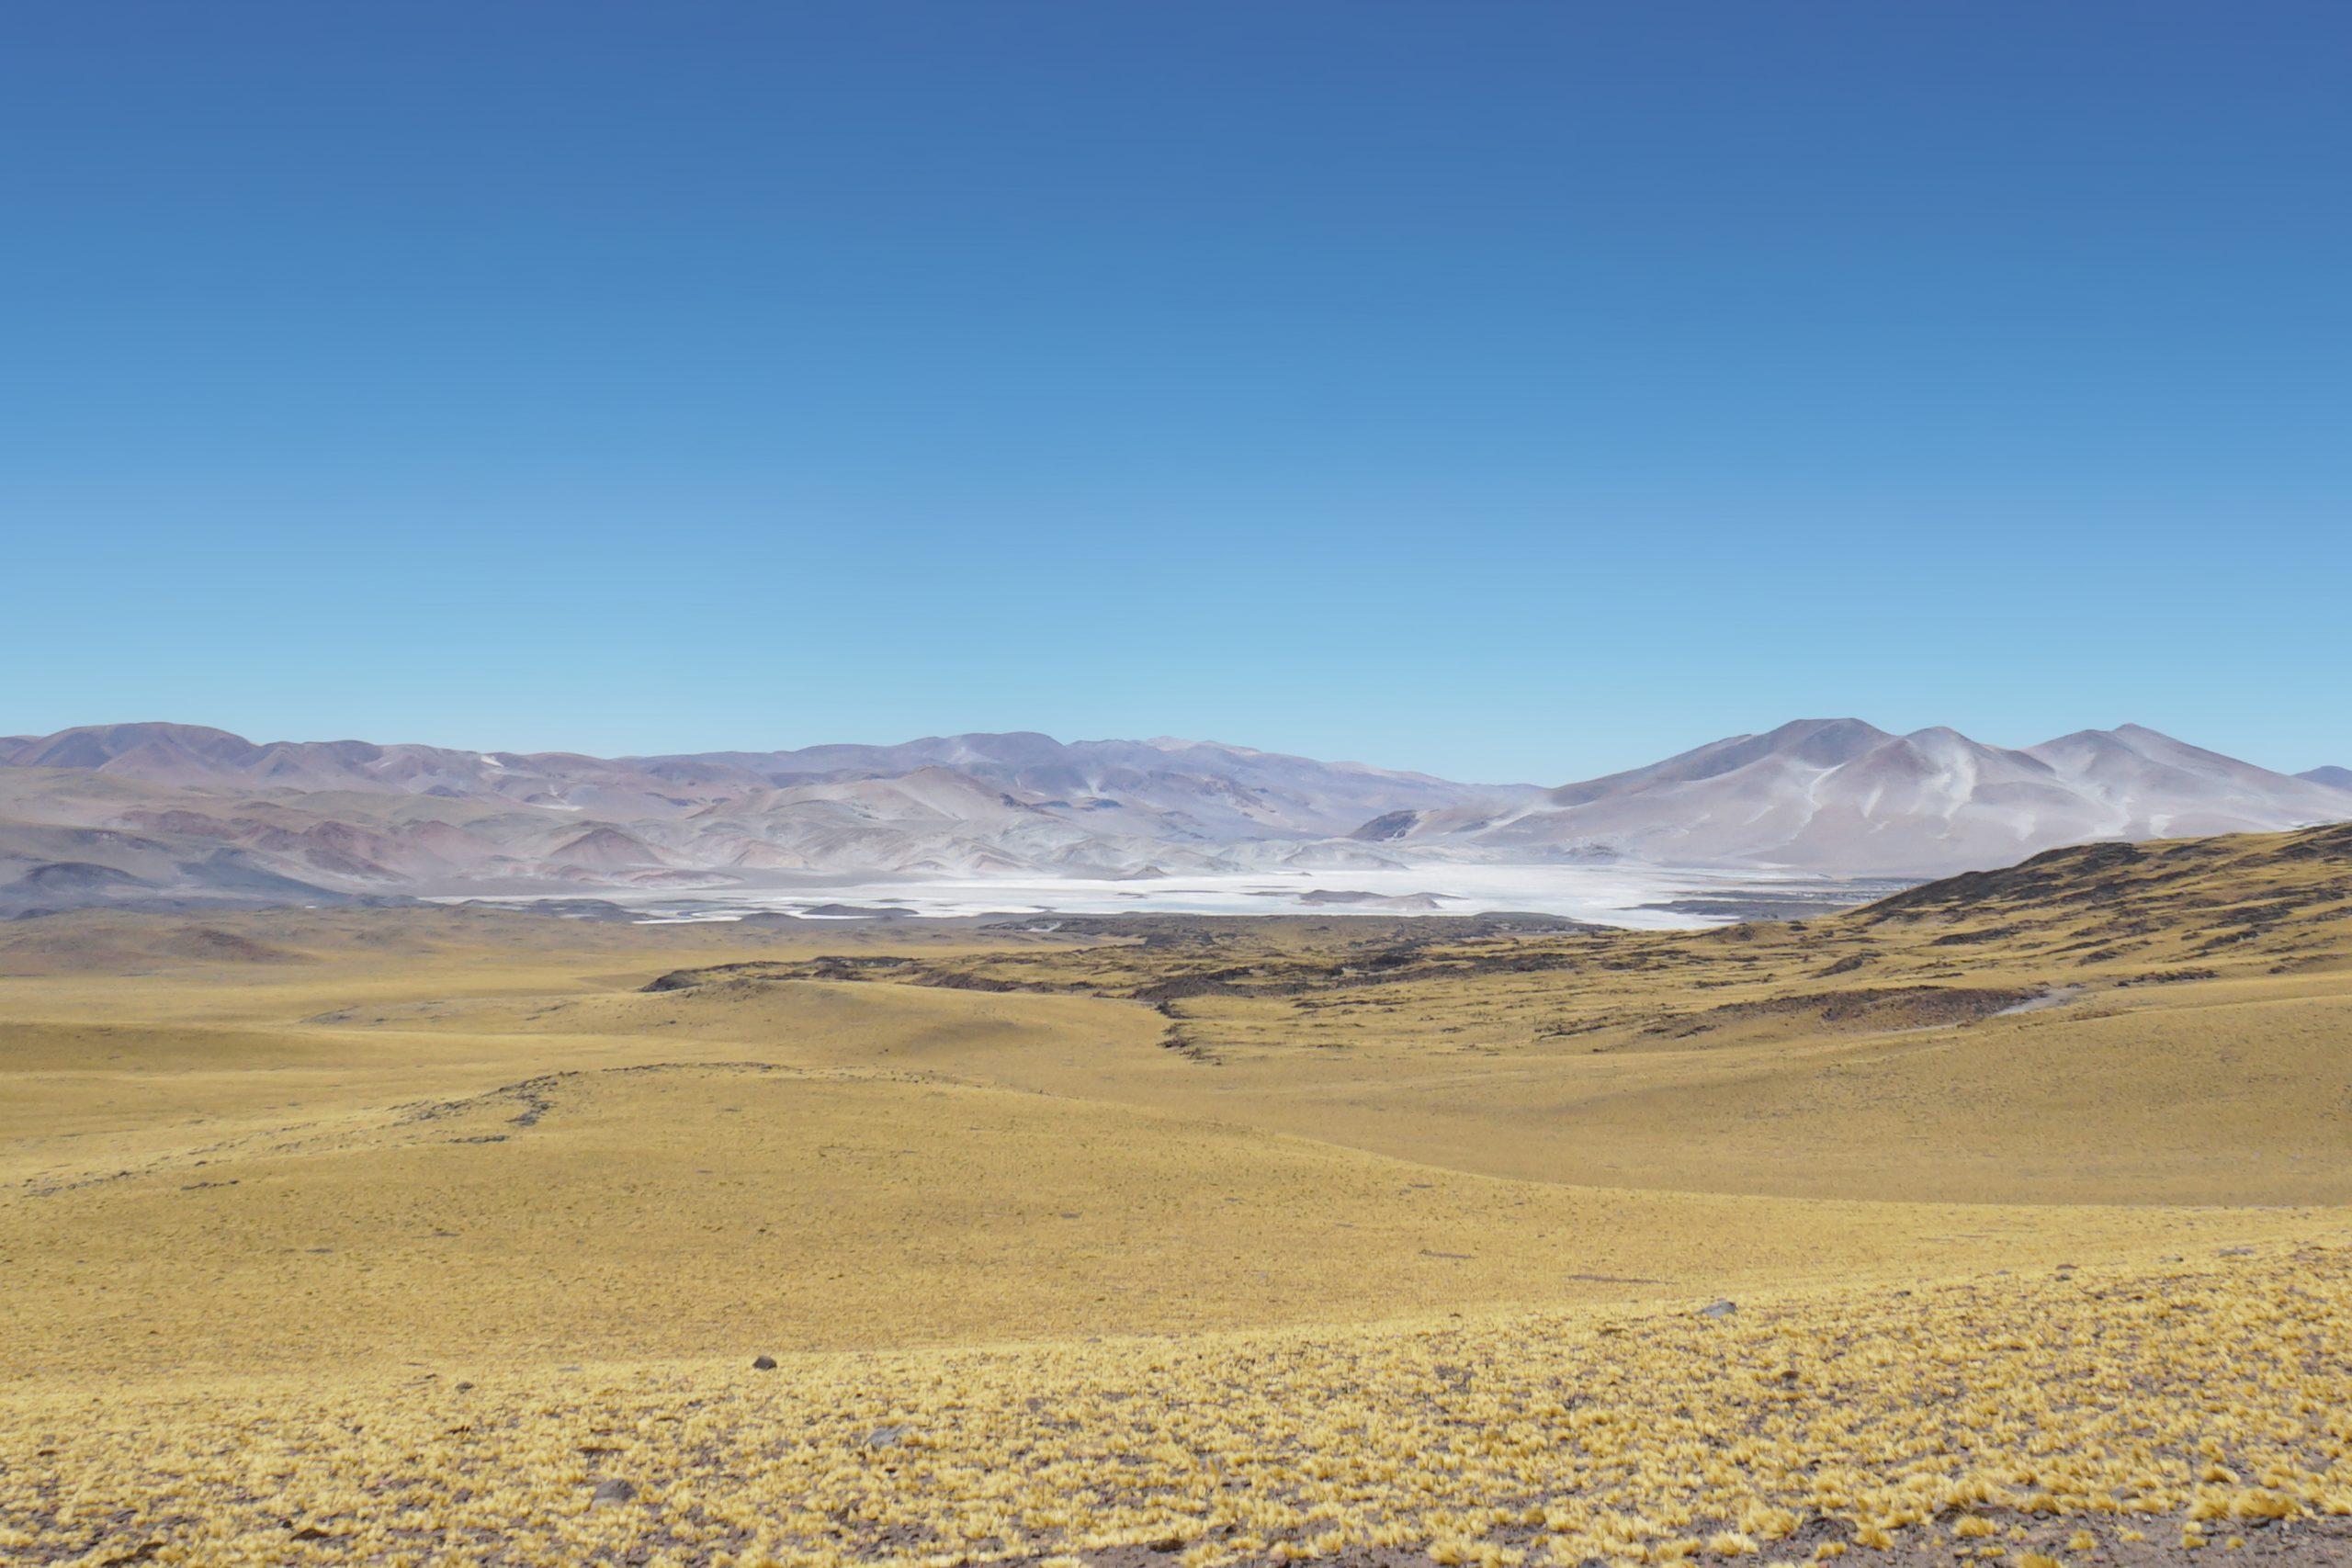 Radreise Südamerika 2019 - Salar am Paso San Francisco